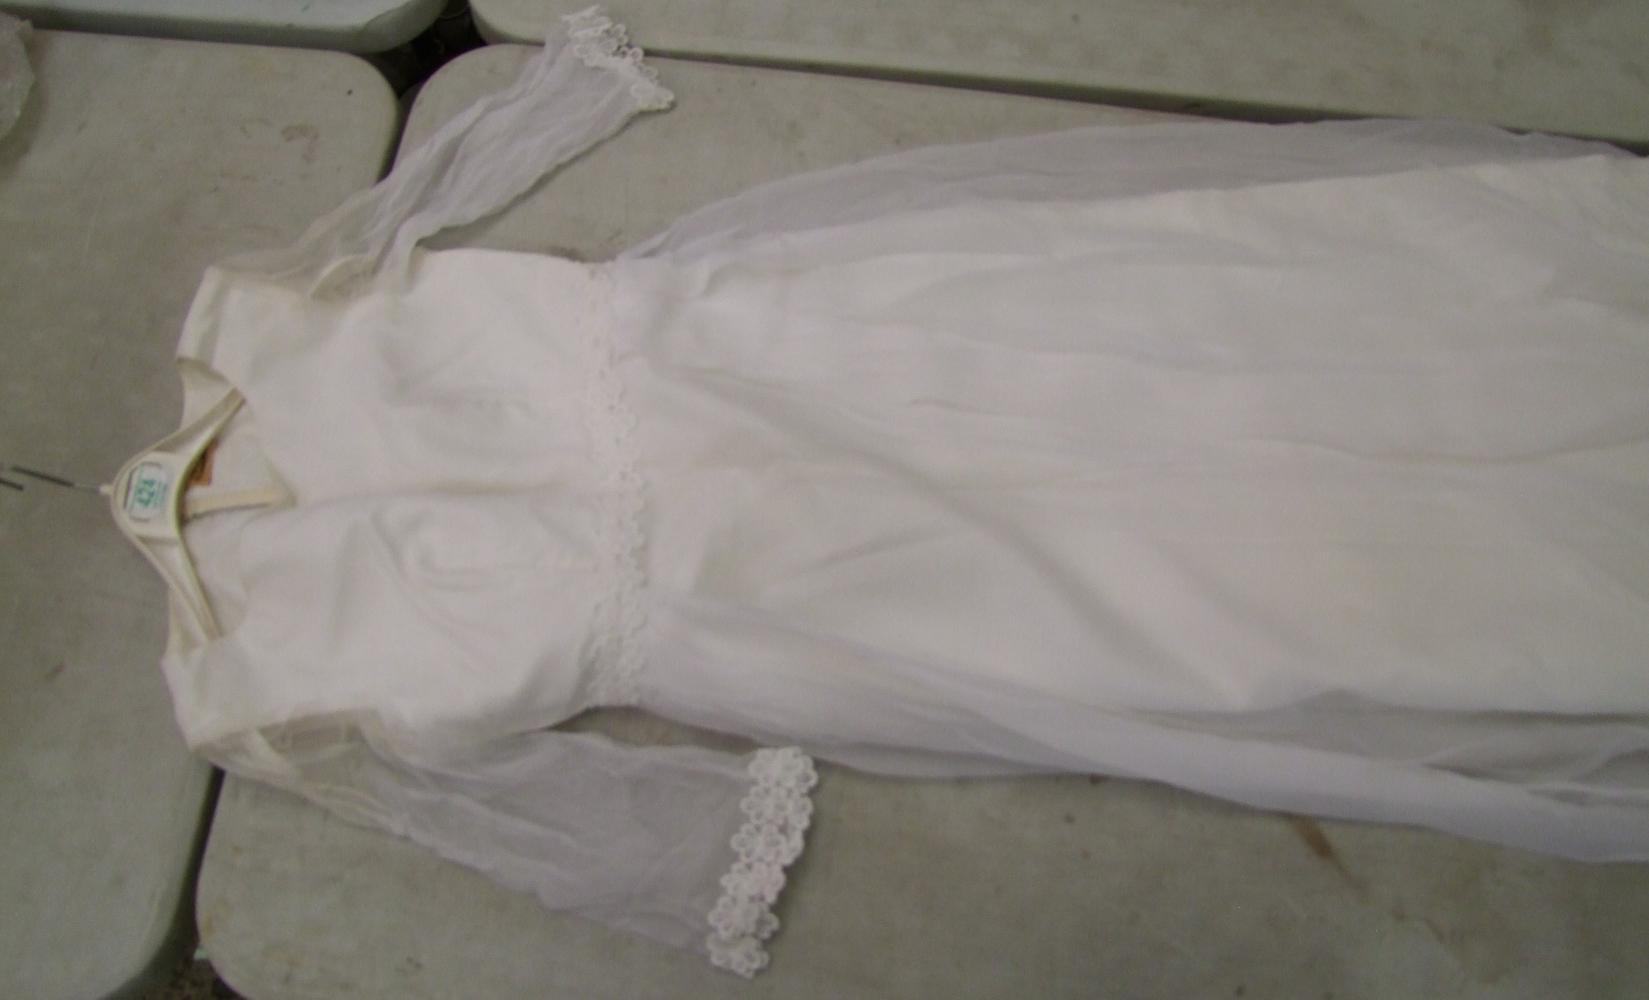 Lot 424 - Vintage Emenson Wedding Dress: Vintage Emenson Wedding Dress size 6-8